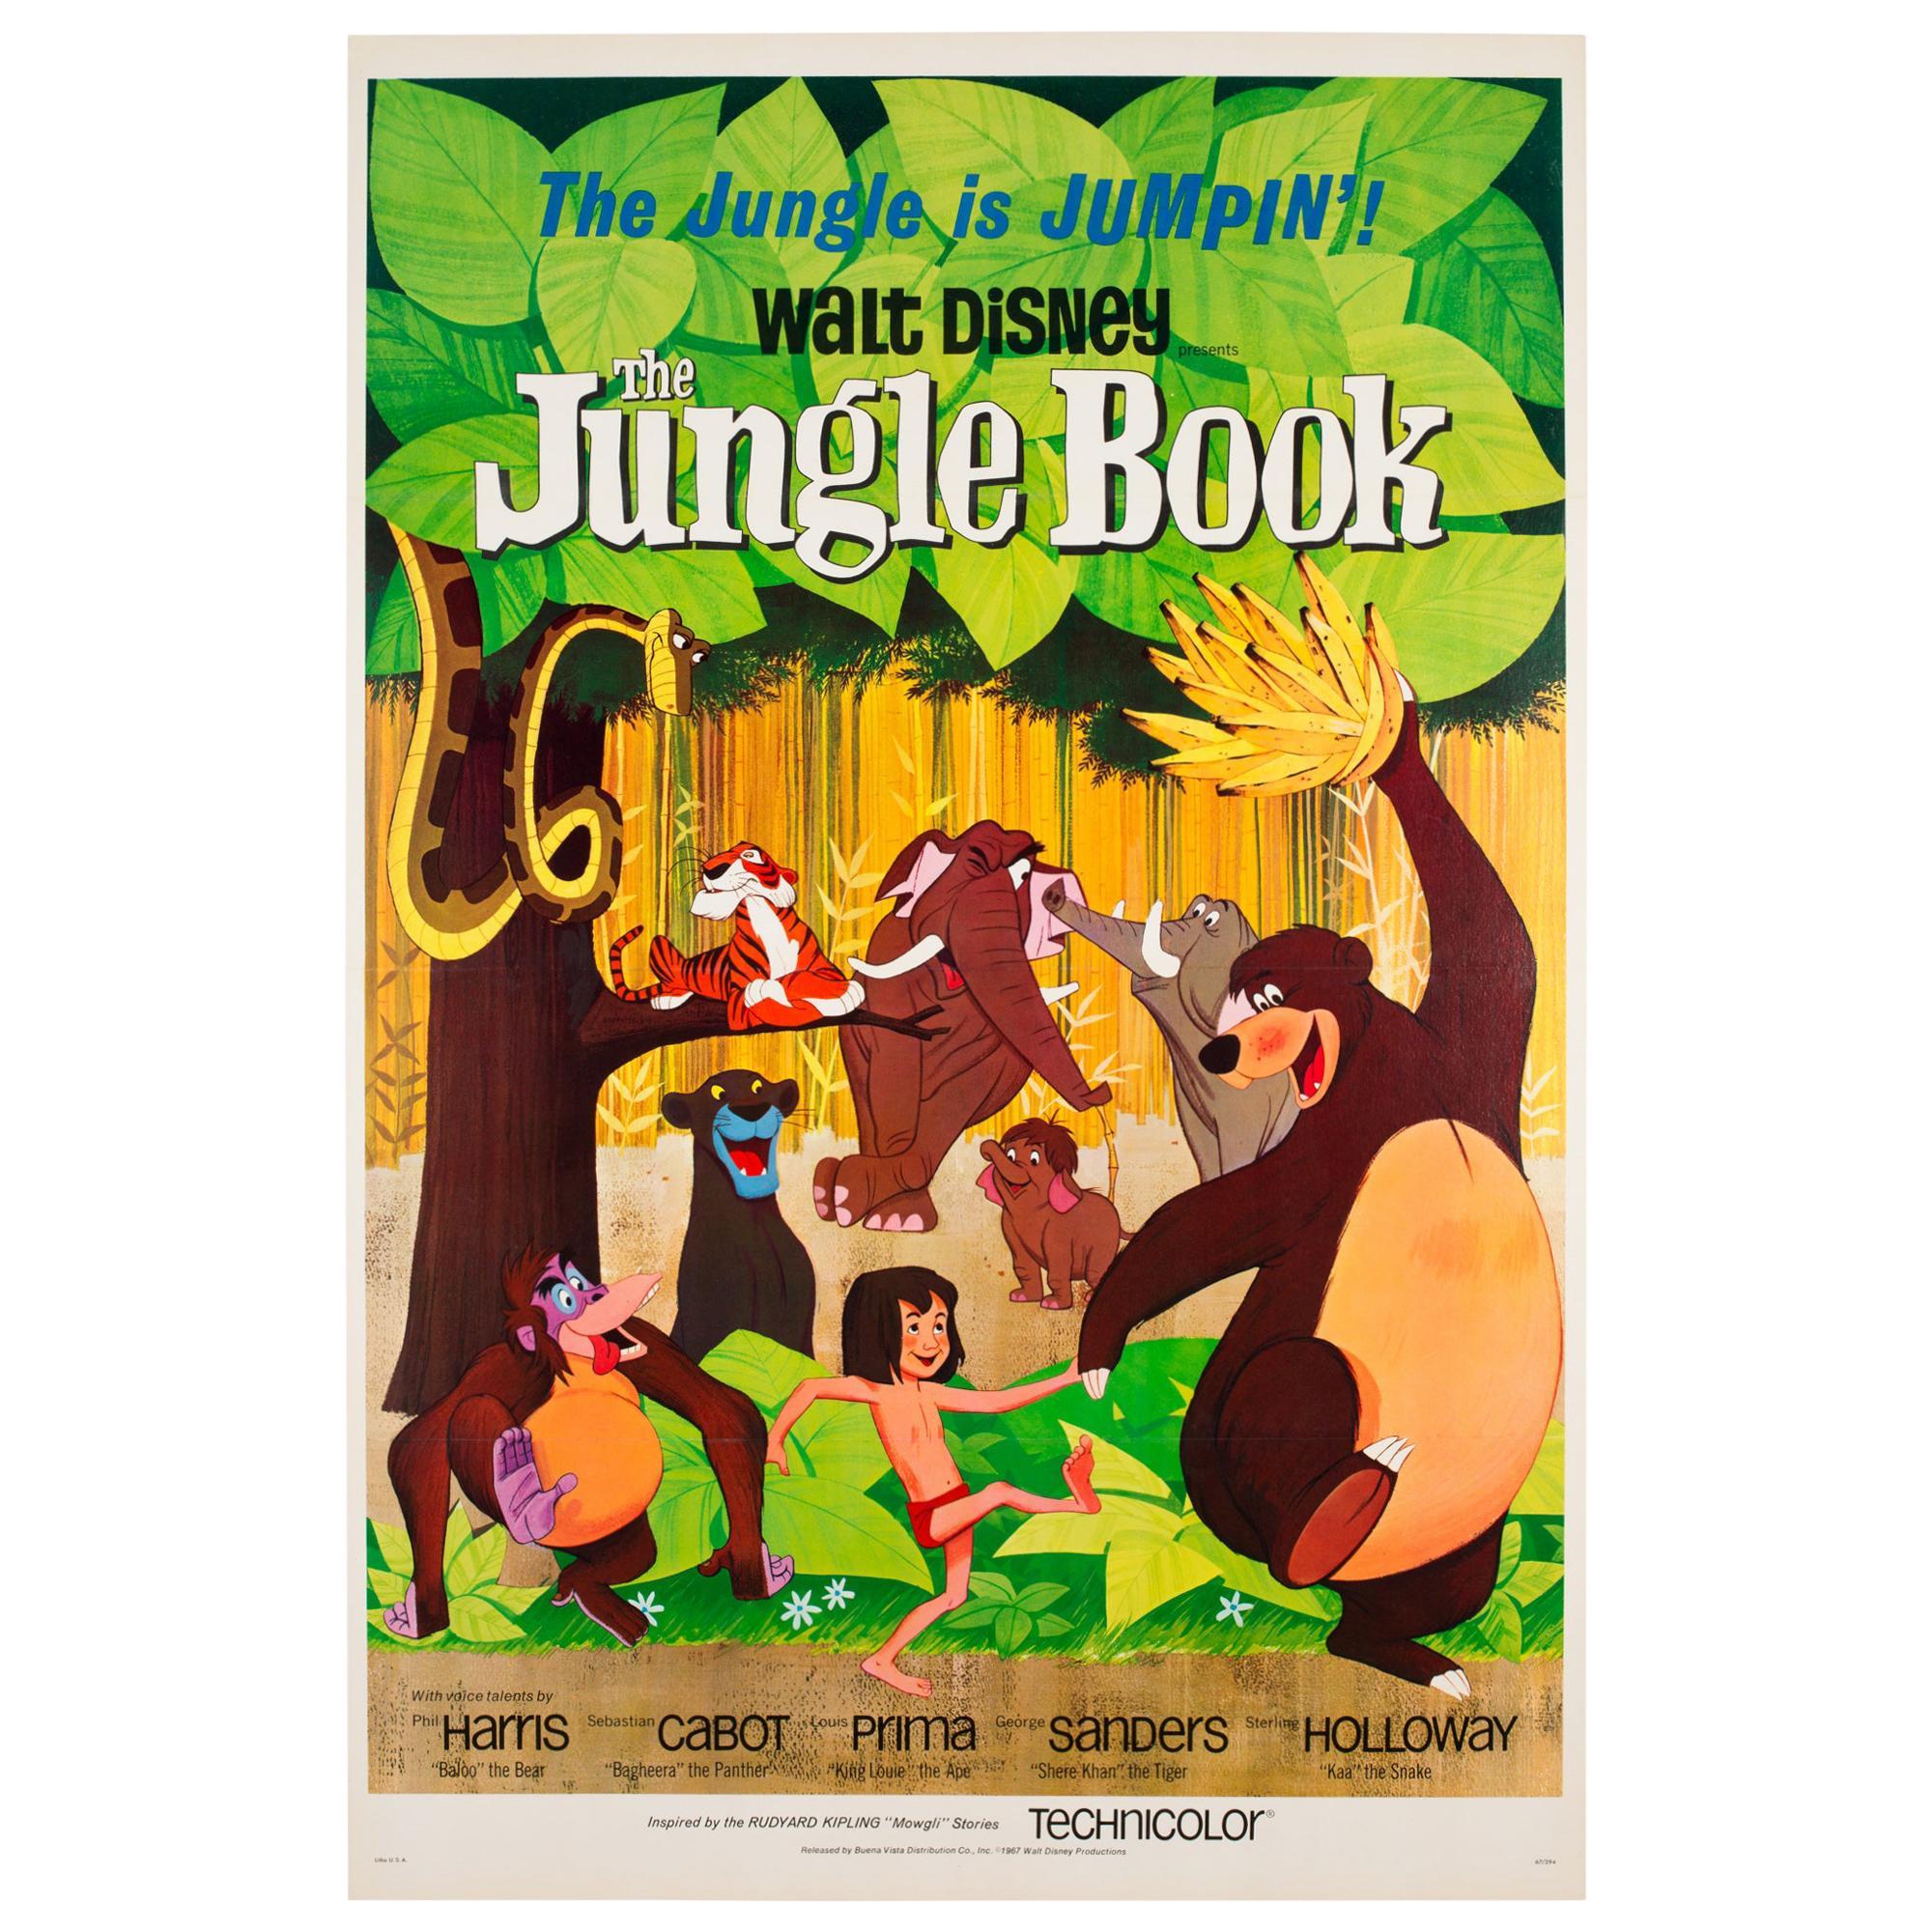 The Jungle Book 1967 US 1 Sheet Film Poster, Disney